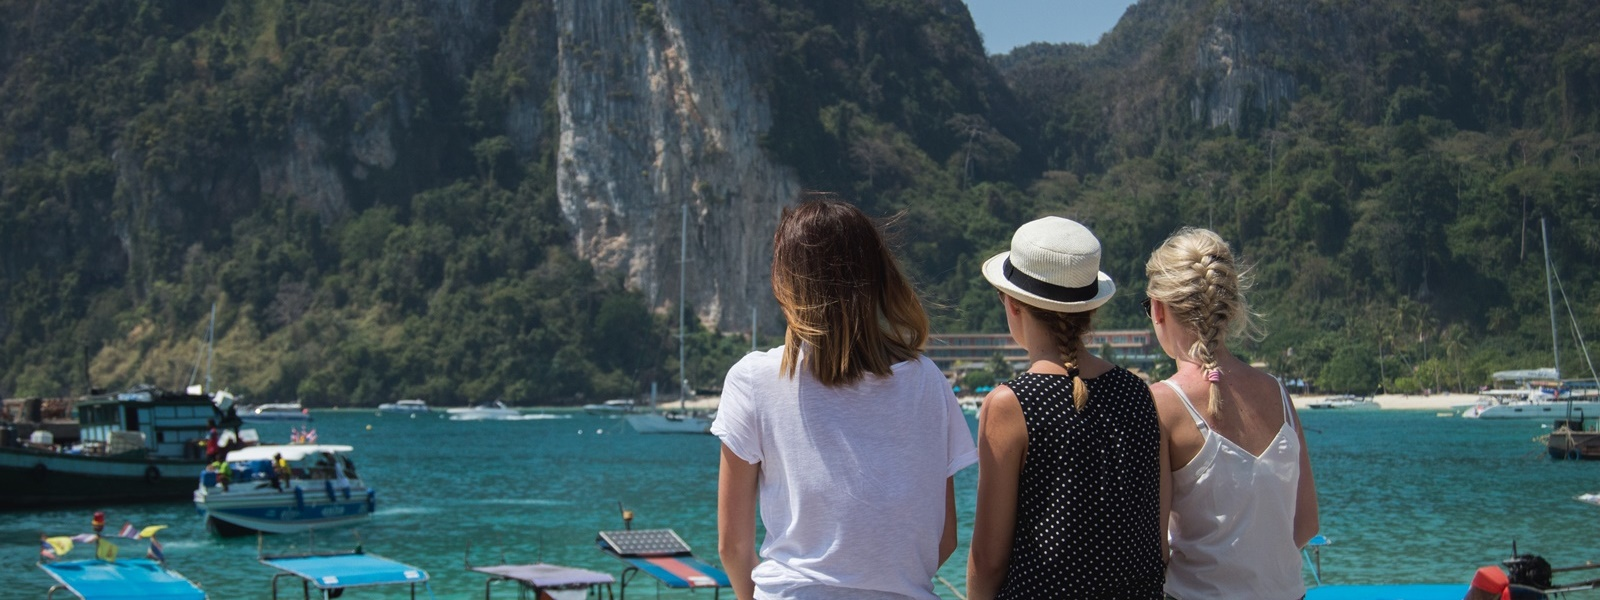 Tajlandia cz. 2 – Ko Phi Phi Don, kokosy o poranku i plaża z małpkami – Eat Make Up Dress